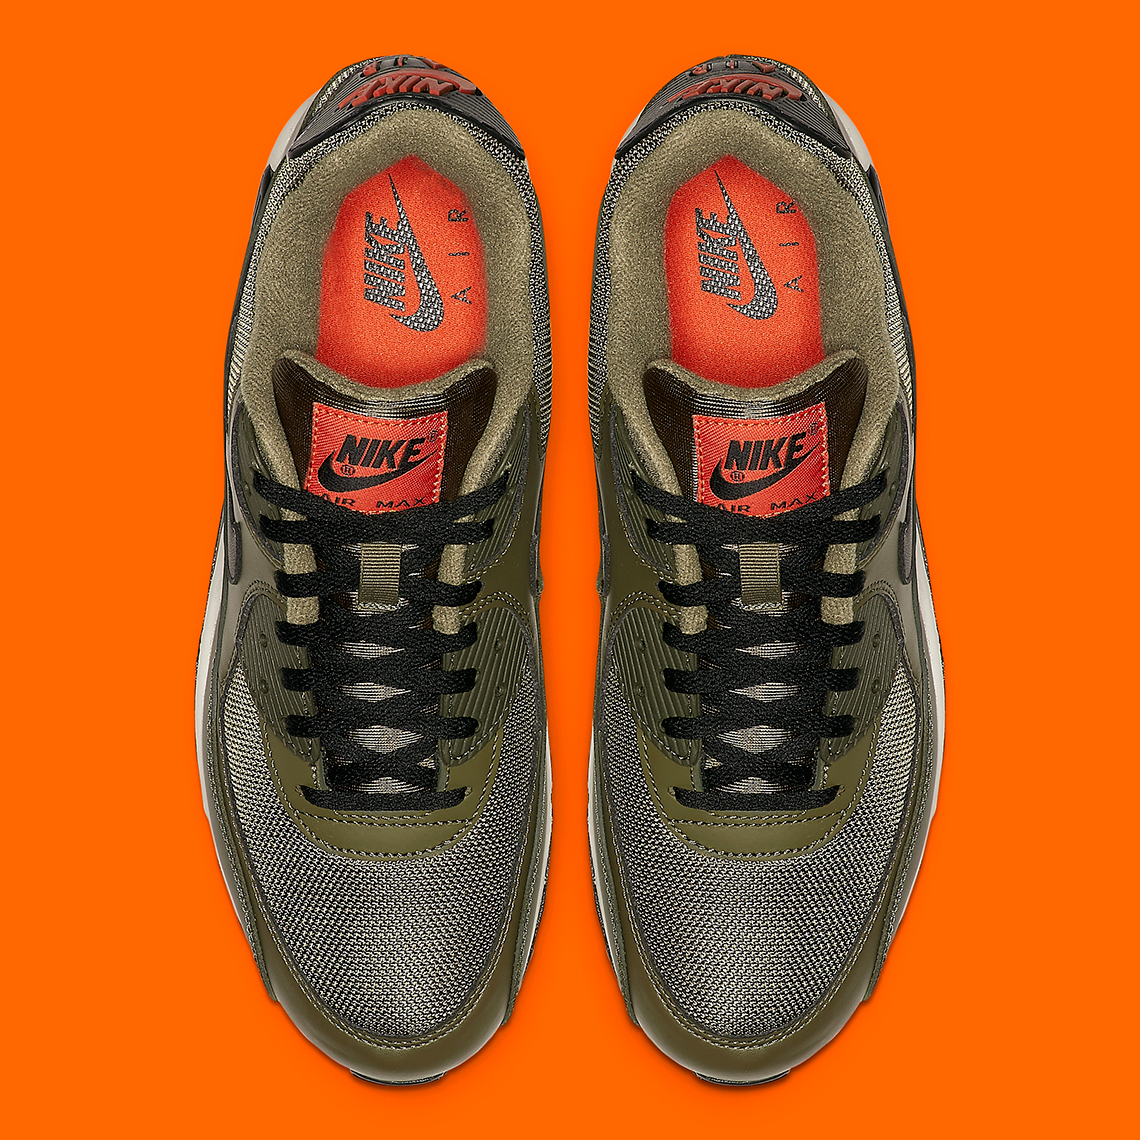 Nike Air Max 90 Ultra 2.0 sneakers kopen BESLIST.nl